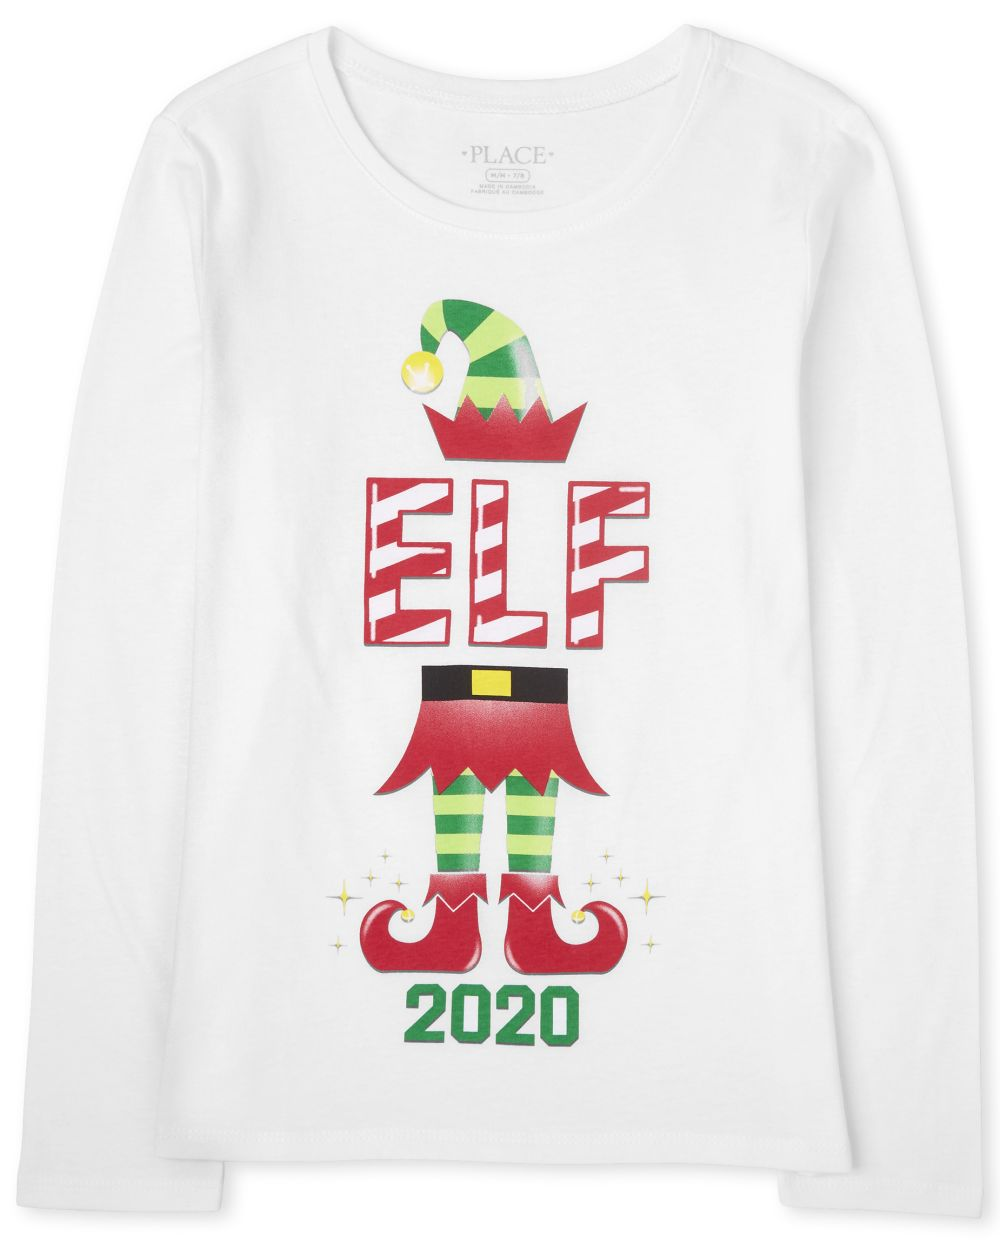 Girls Matching Family Christmas Elf Graphic Tee